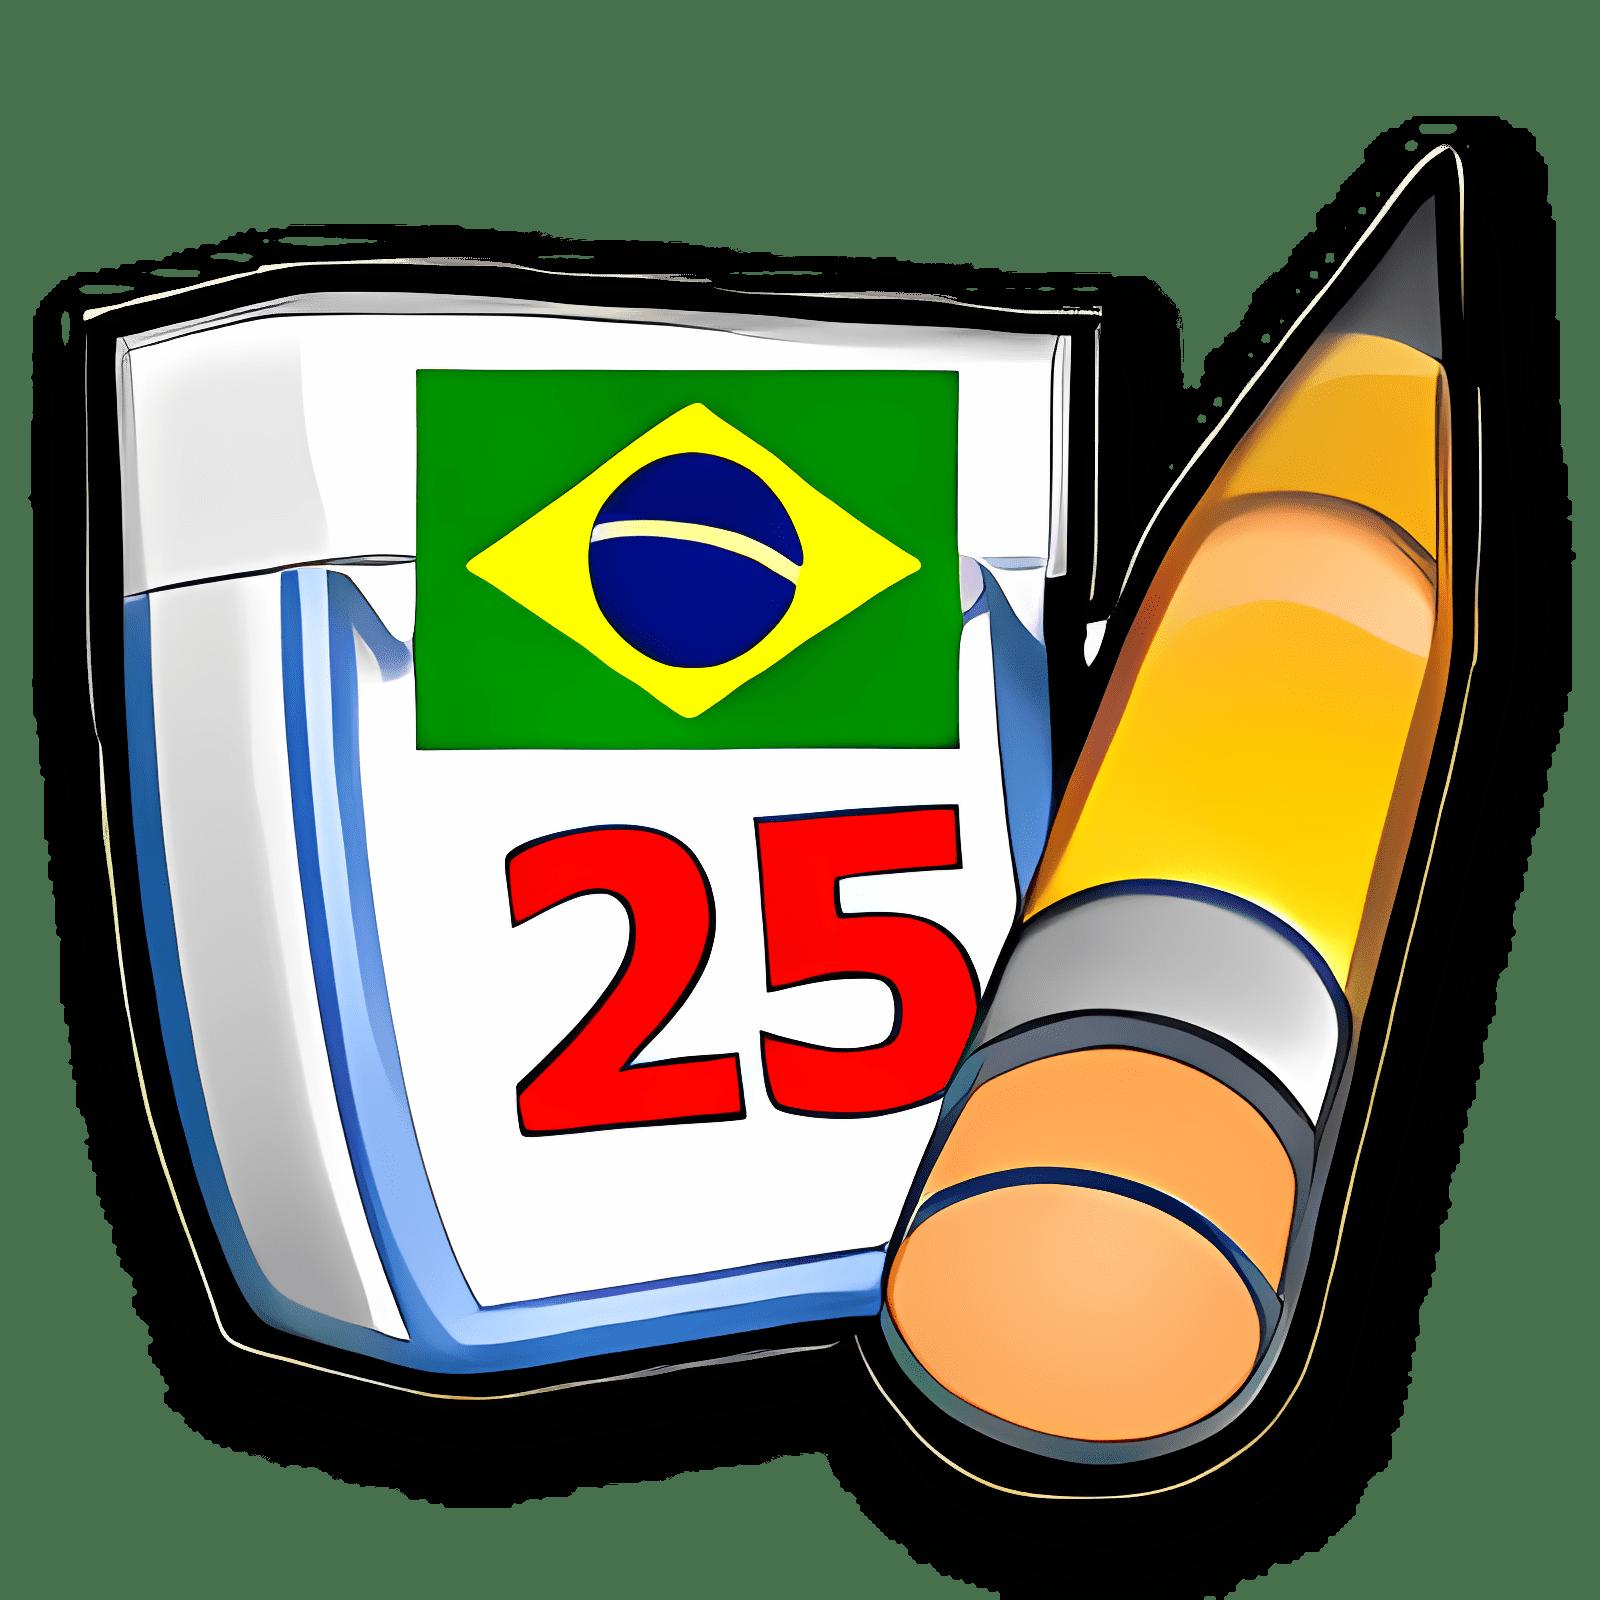 Brazilian Portuguese for Rainlendar